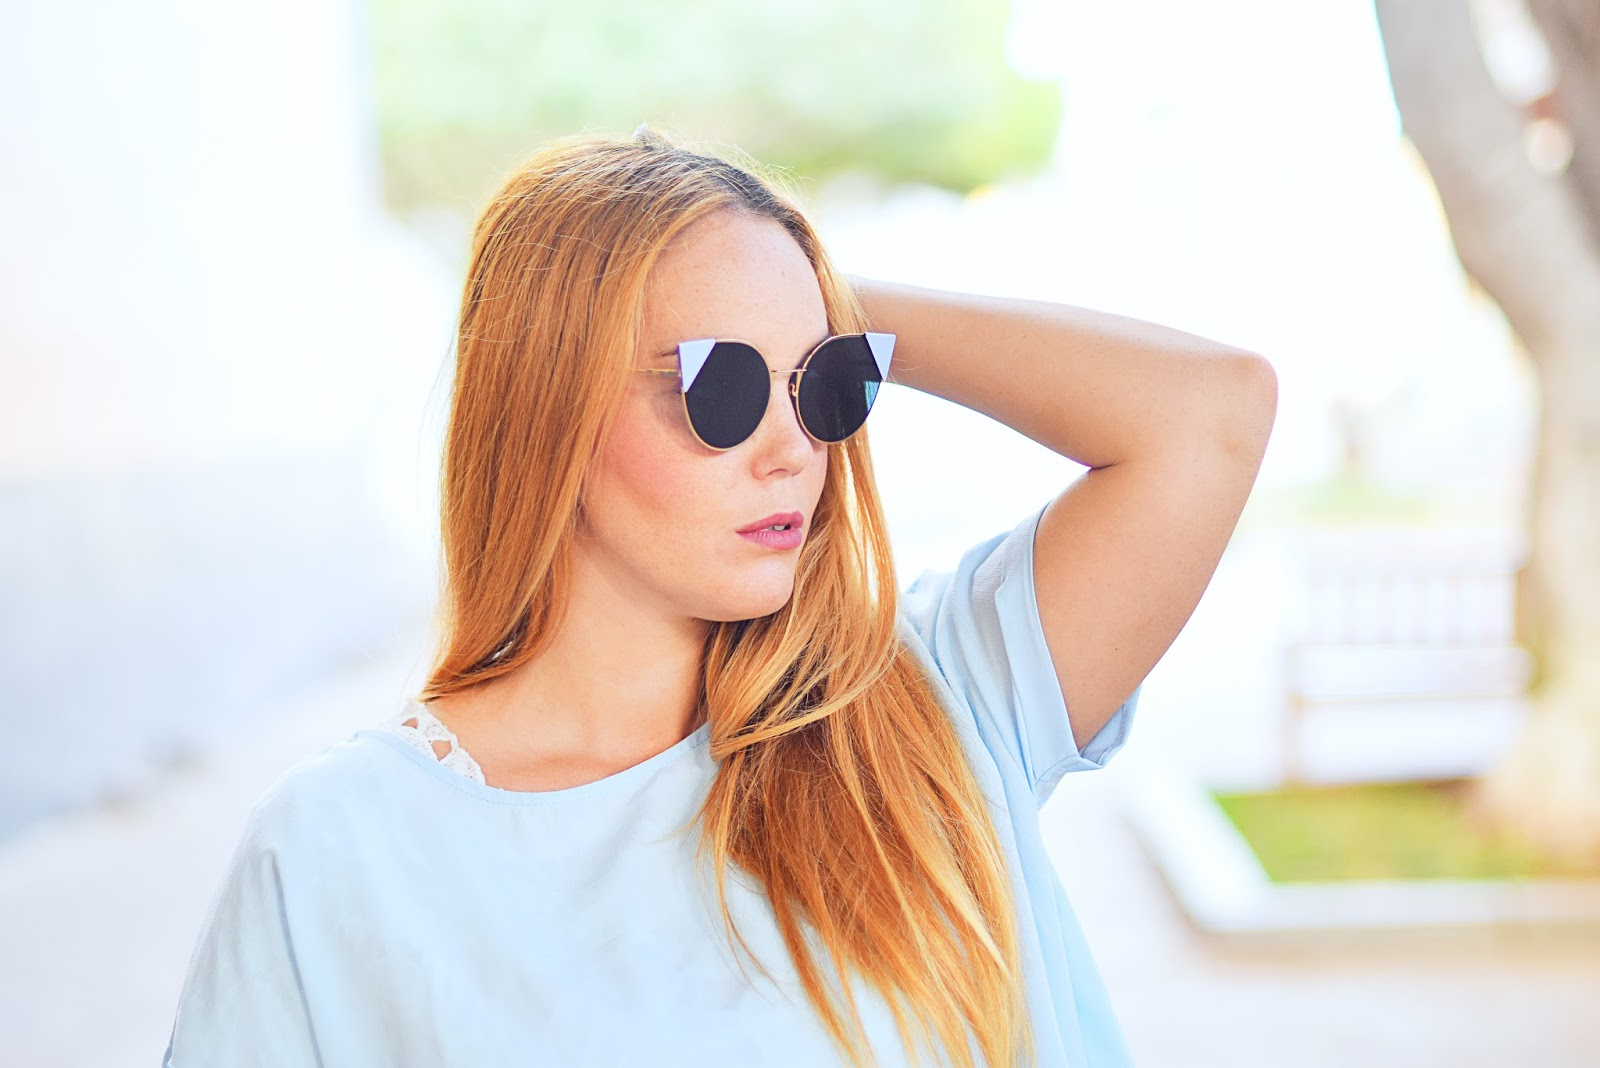 NERY HDEZ, CNDIRECT, Fendi sunglasses, opticalh, amiclubwear sandals, ottaviani bijoux